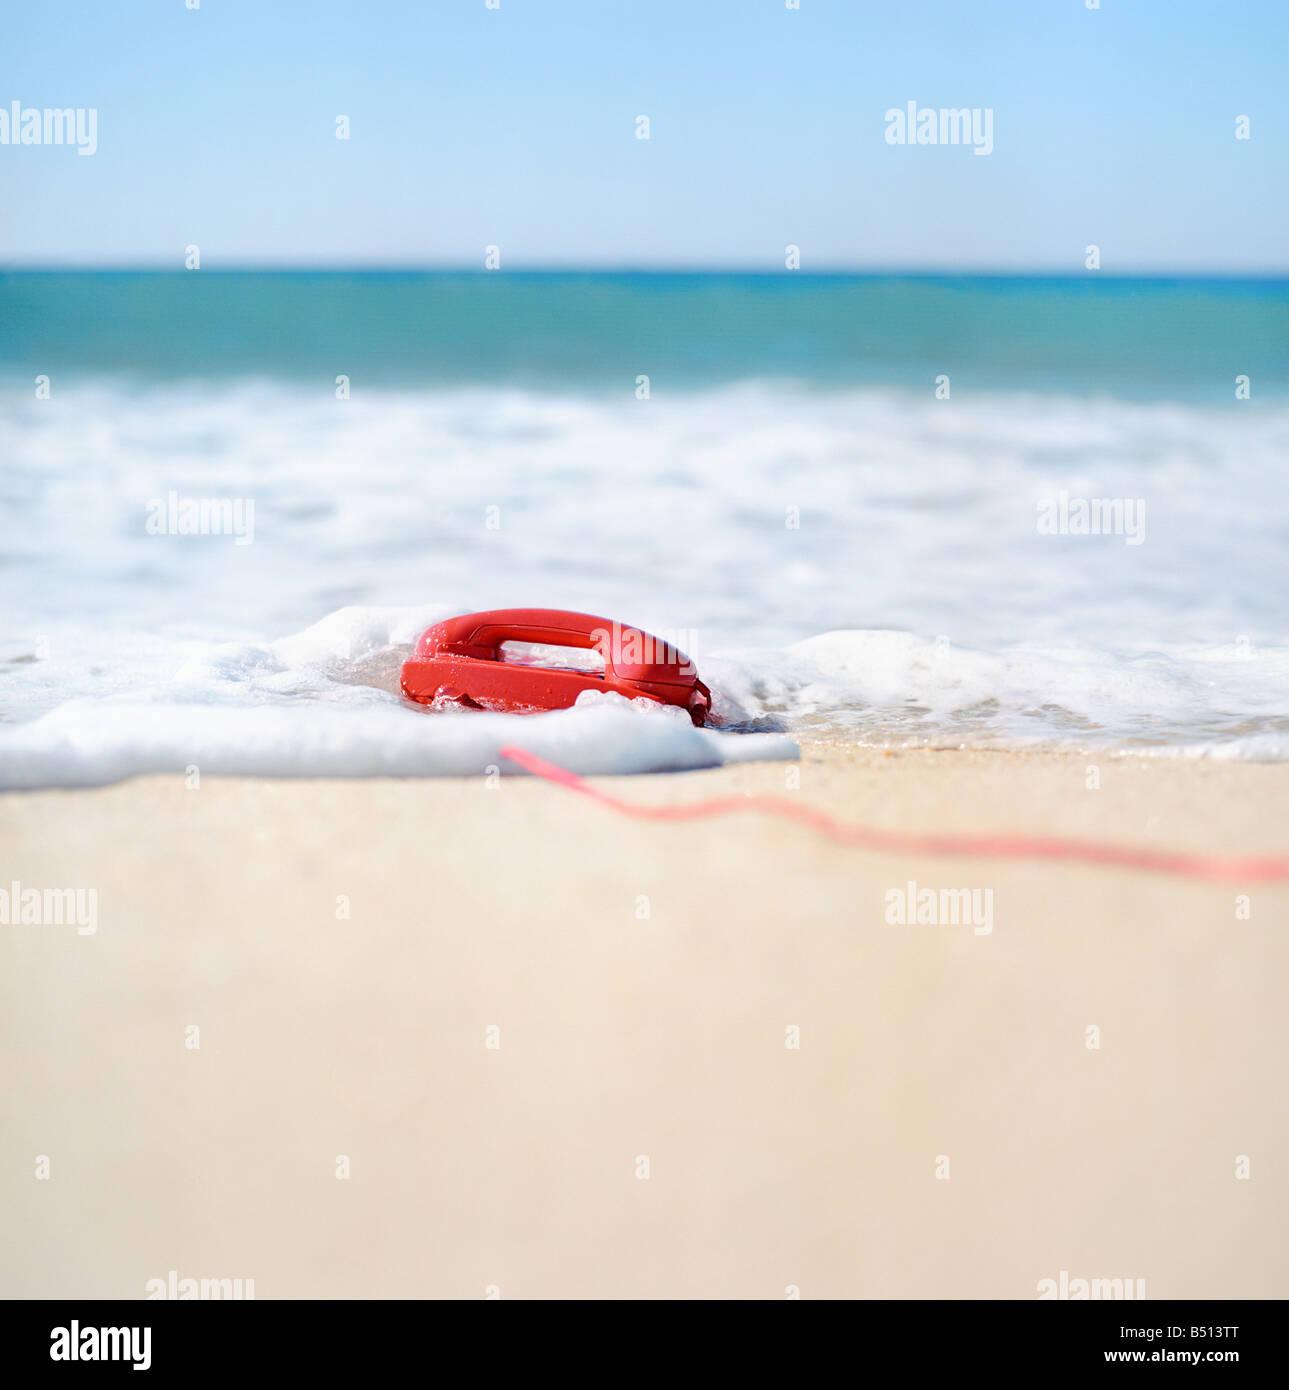 Landline telephone in surf on the beach - Stock Image